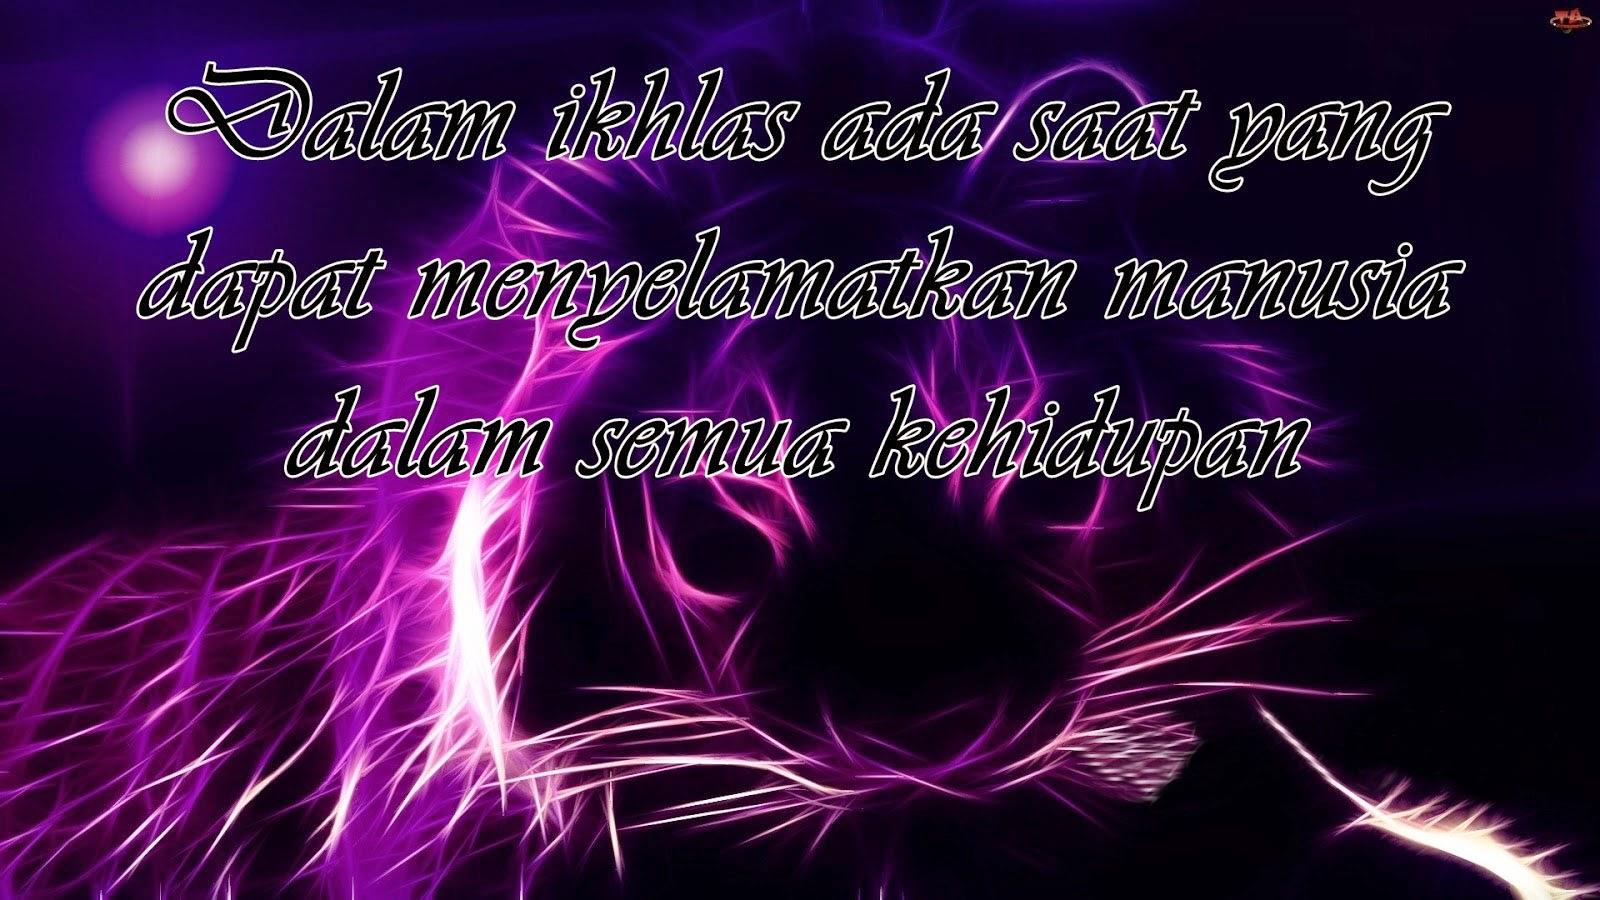 Wallpaper Kata 2 Mutiara Yg Indah HD Wallpaper